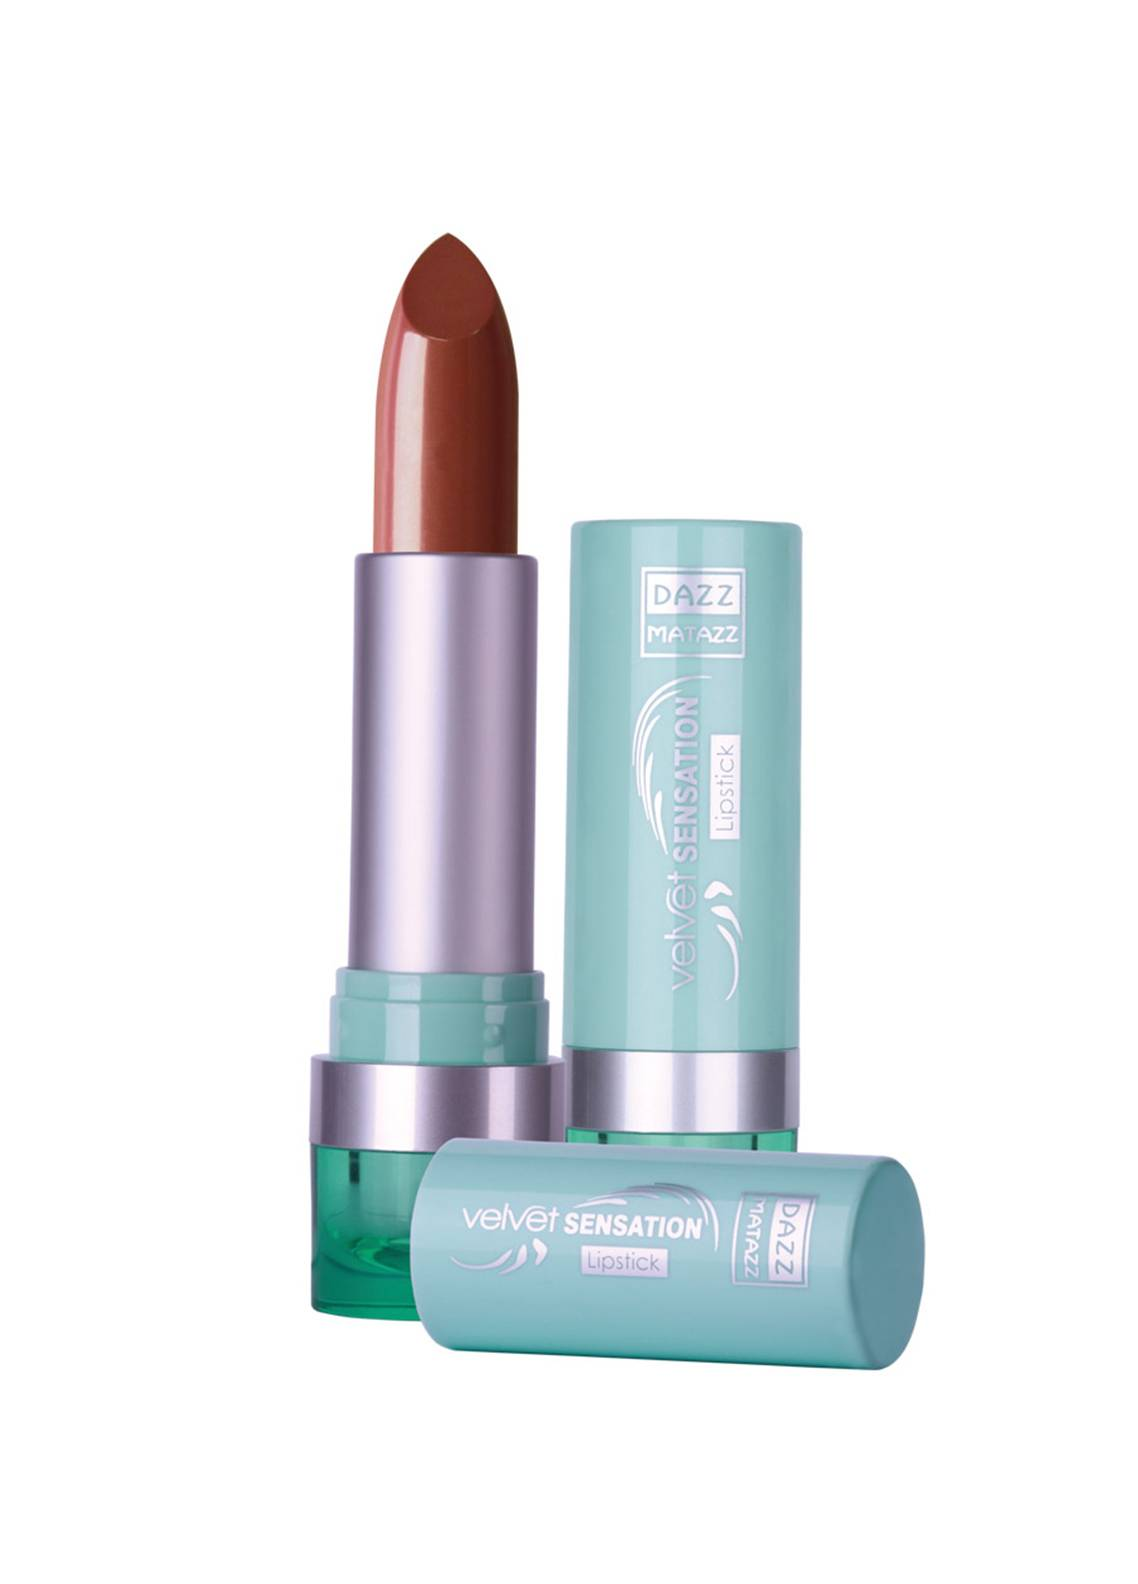 Dazz Matazz Velvet Sensation Lipstick-11 MAPLE FUDGE